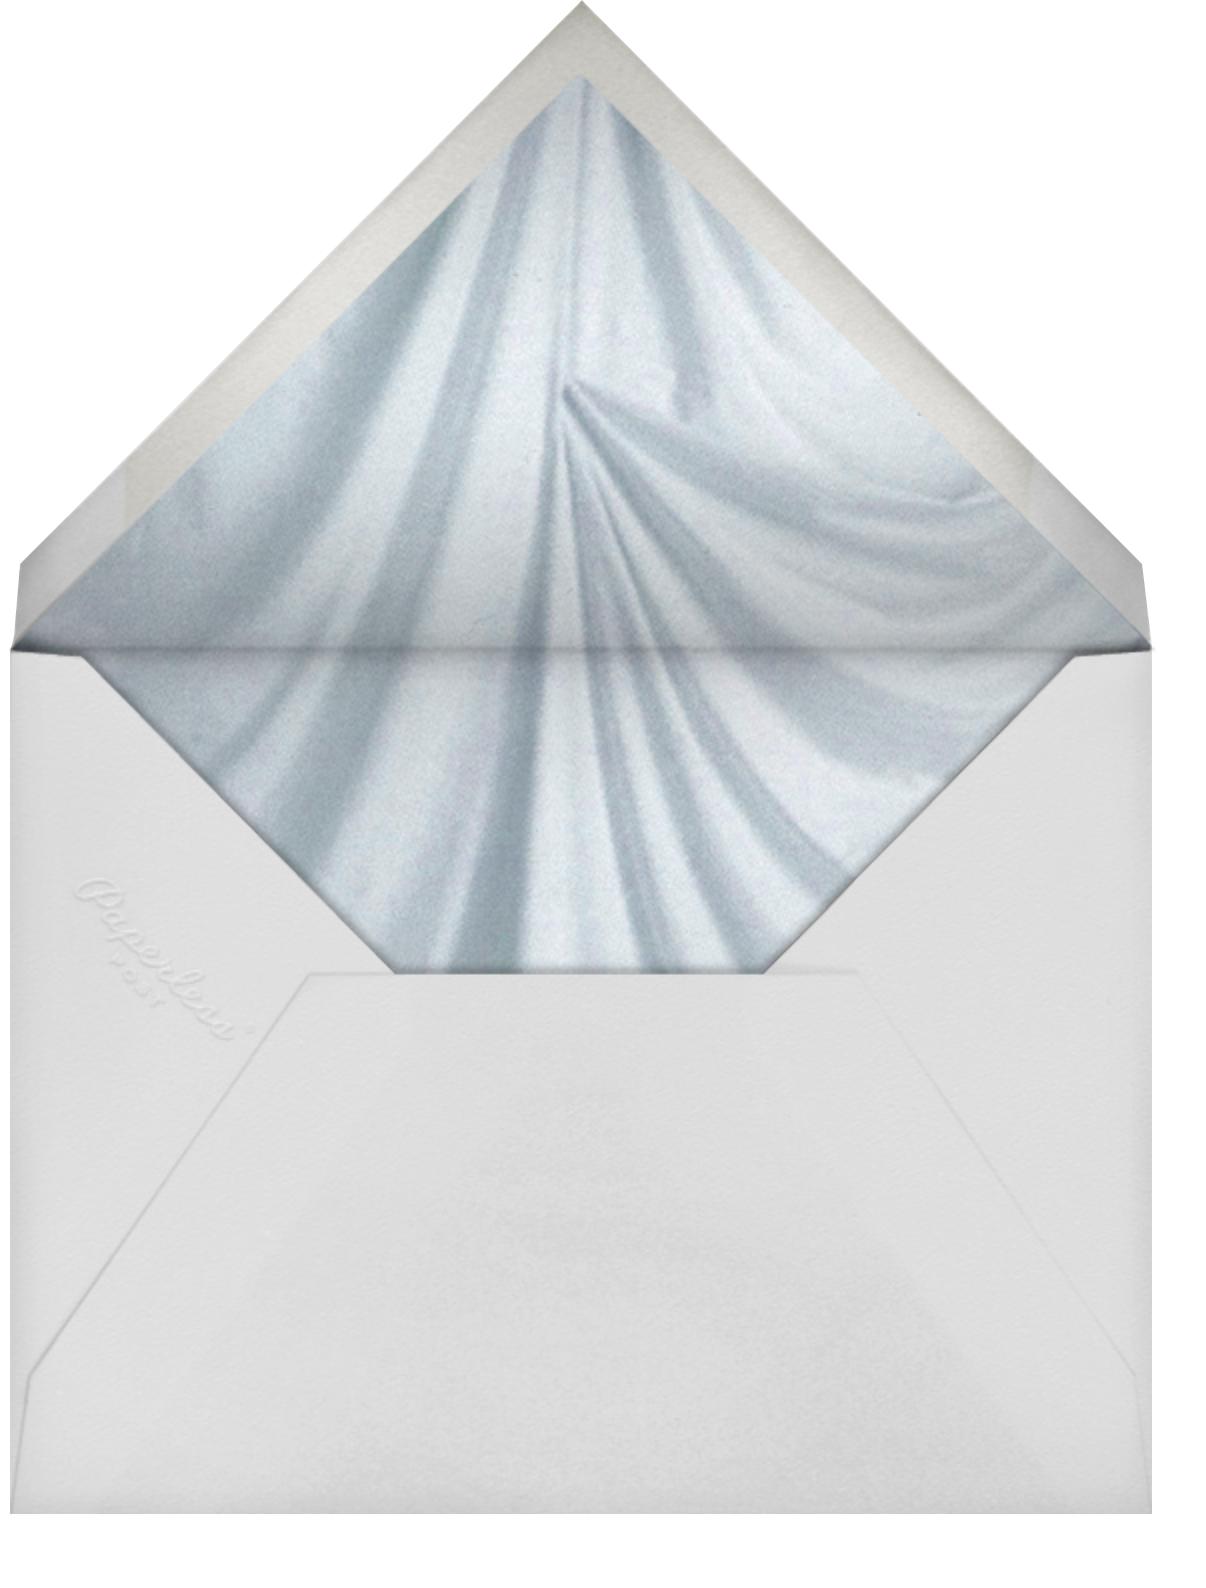 Nebula - Kelly Wearstler - New Year's Eve - envelope back